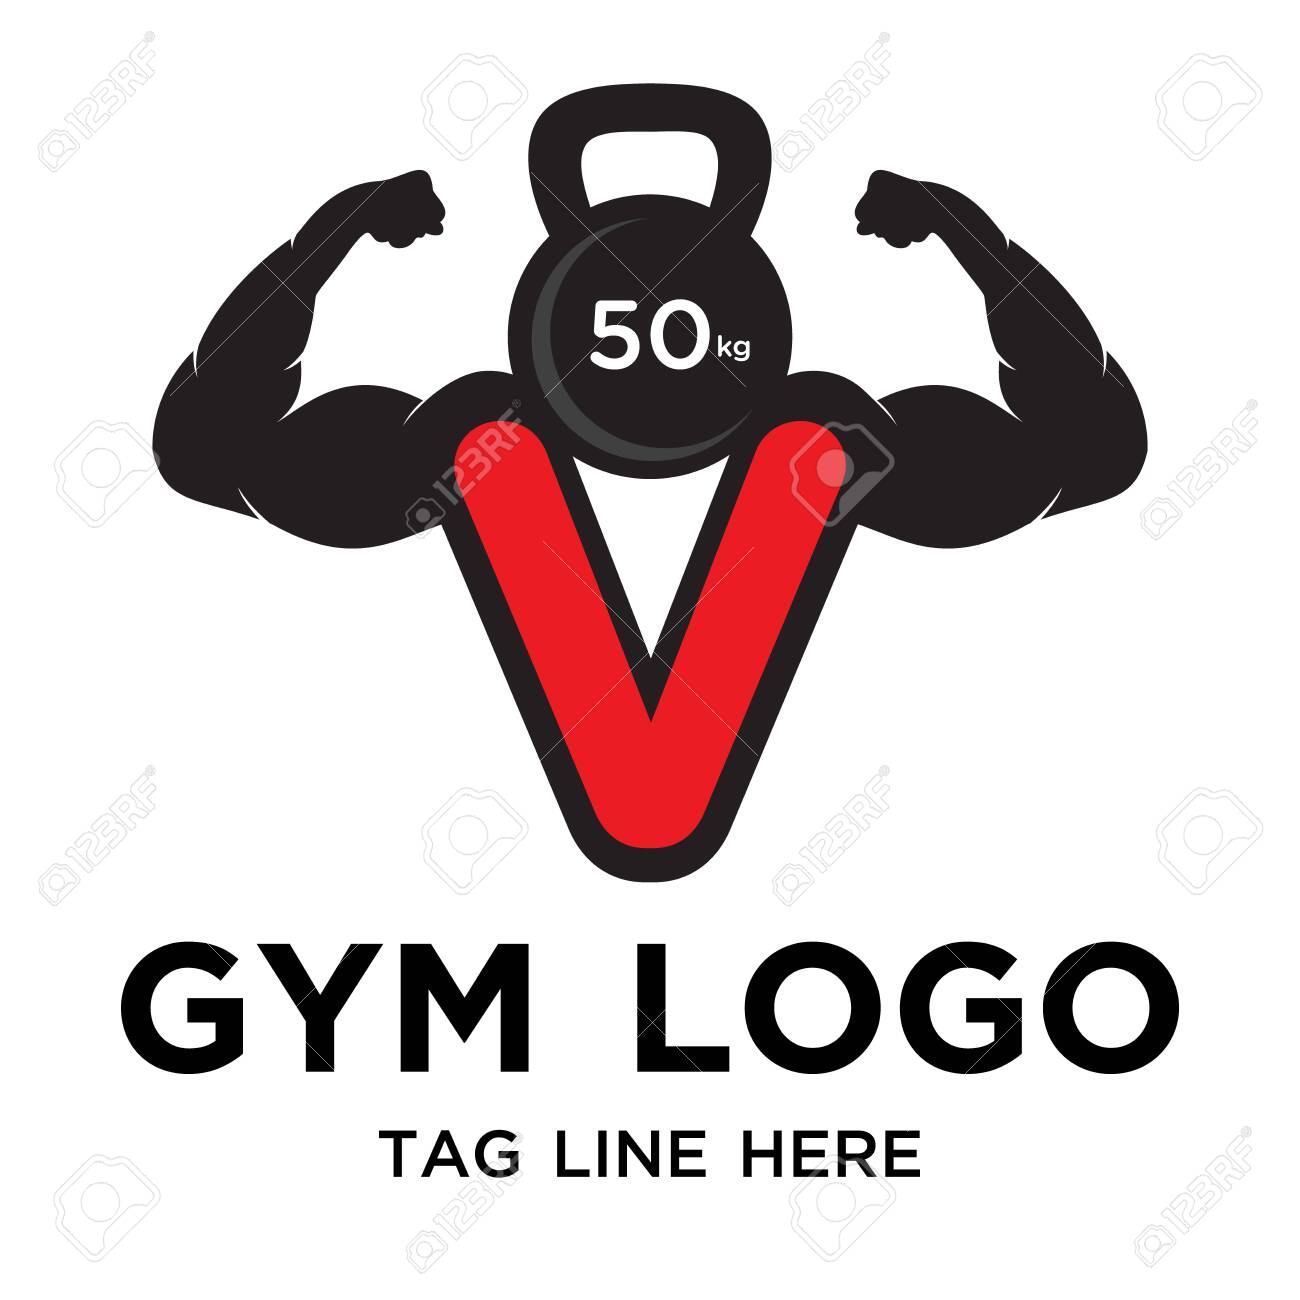 strong gym logo design simple - 150018266